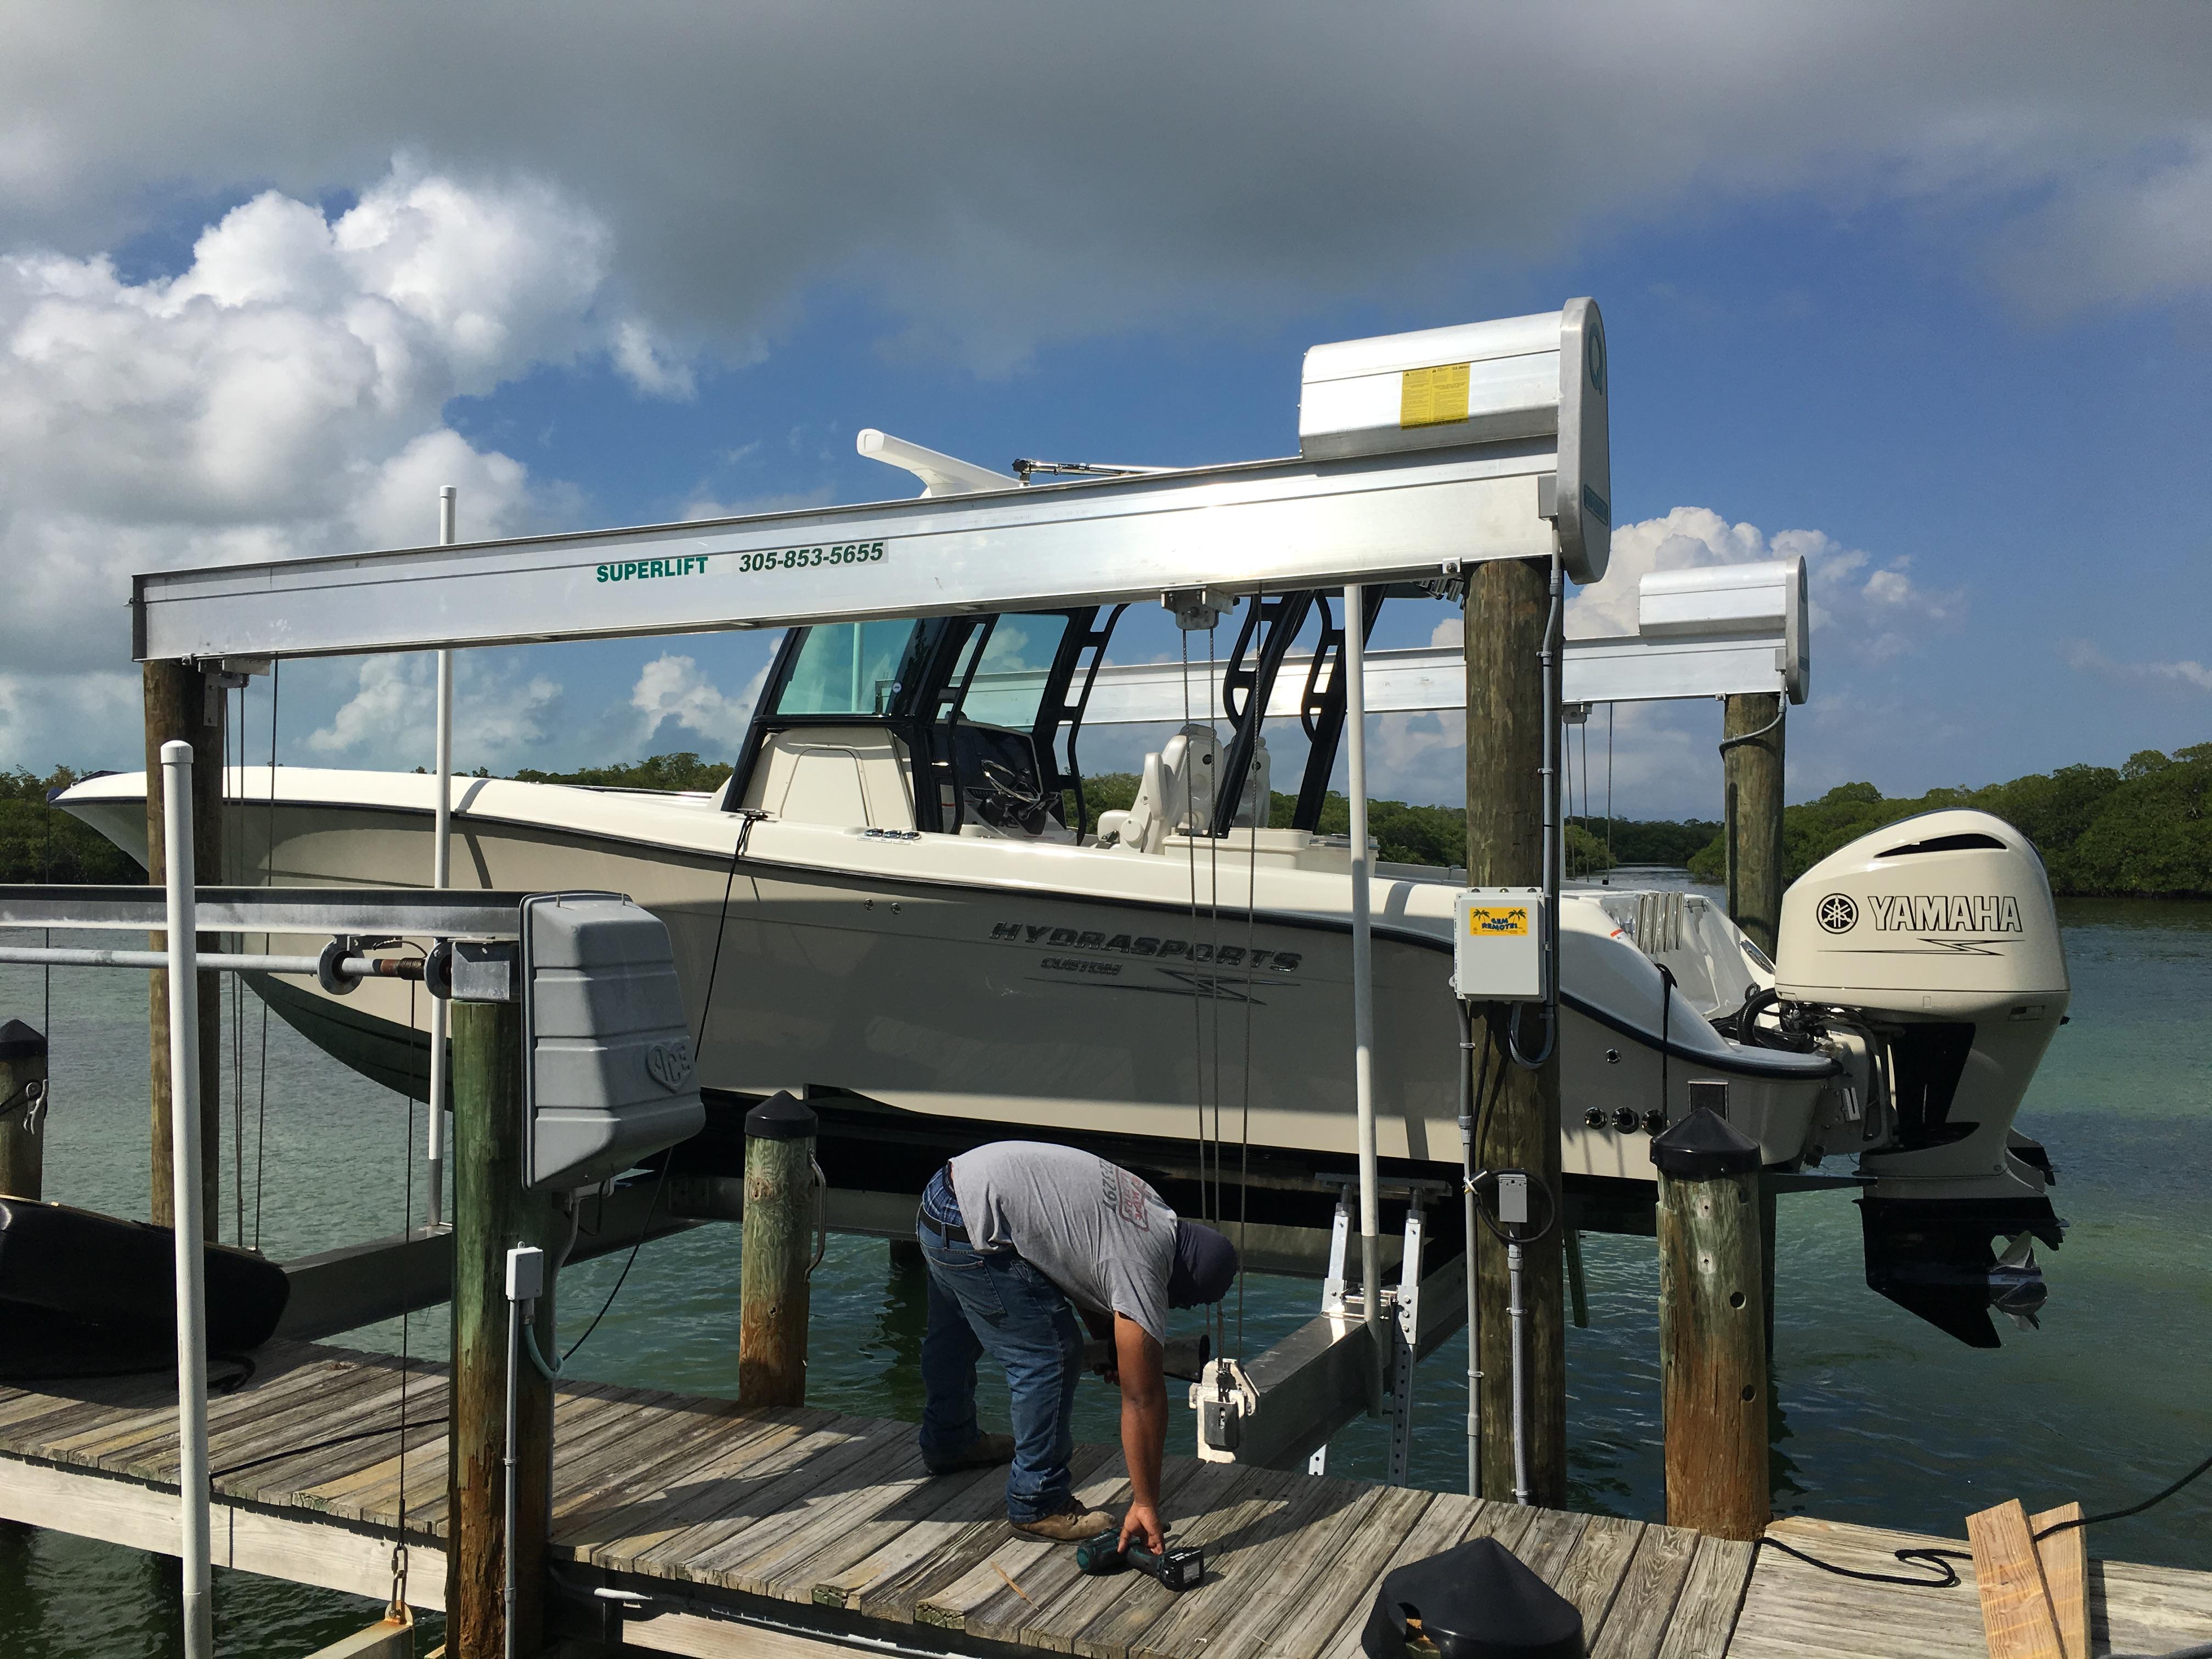 Boat lifts of south florida tavernier florida fl for Key largo buffet